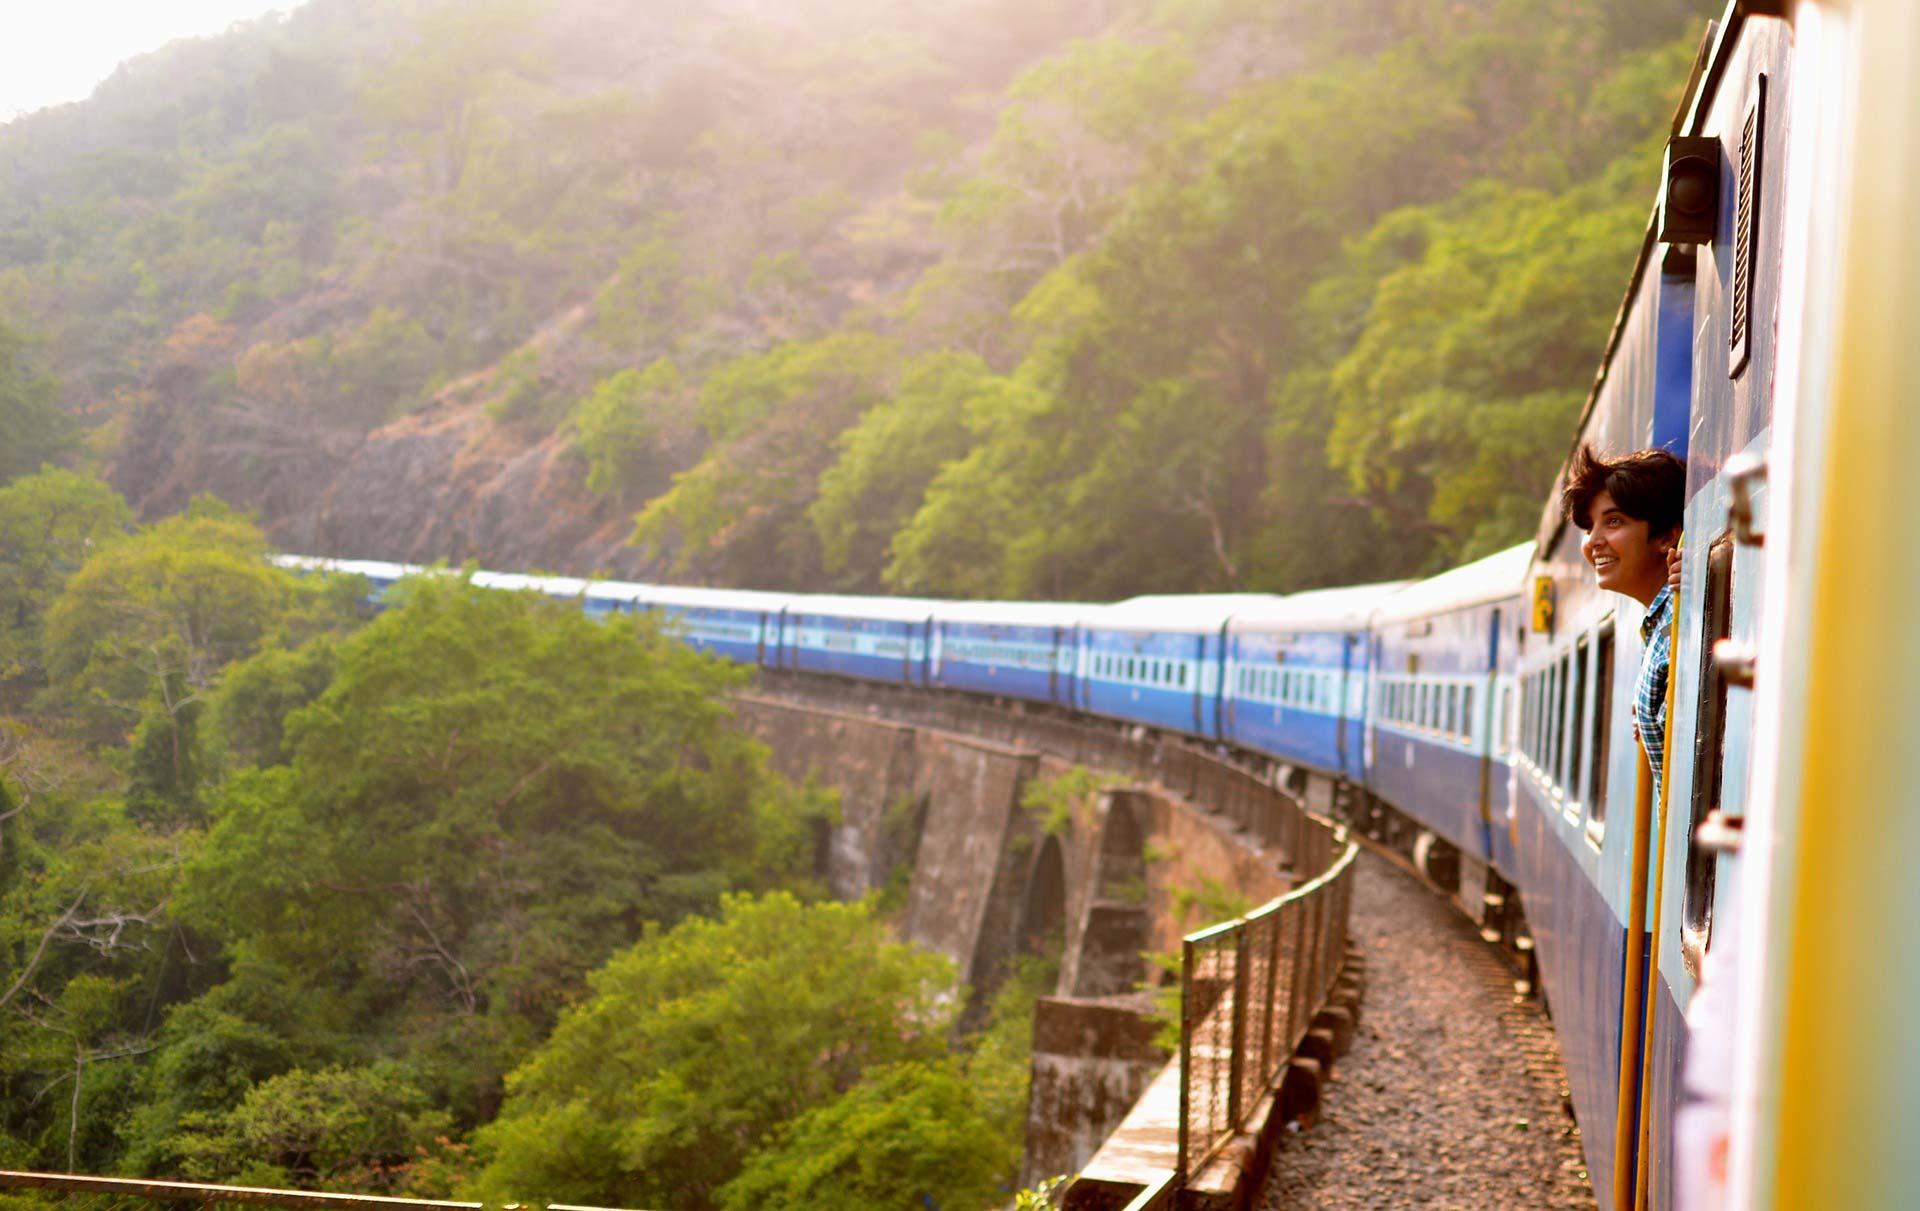 Suburban rail, bengaluru, election, unioun budget